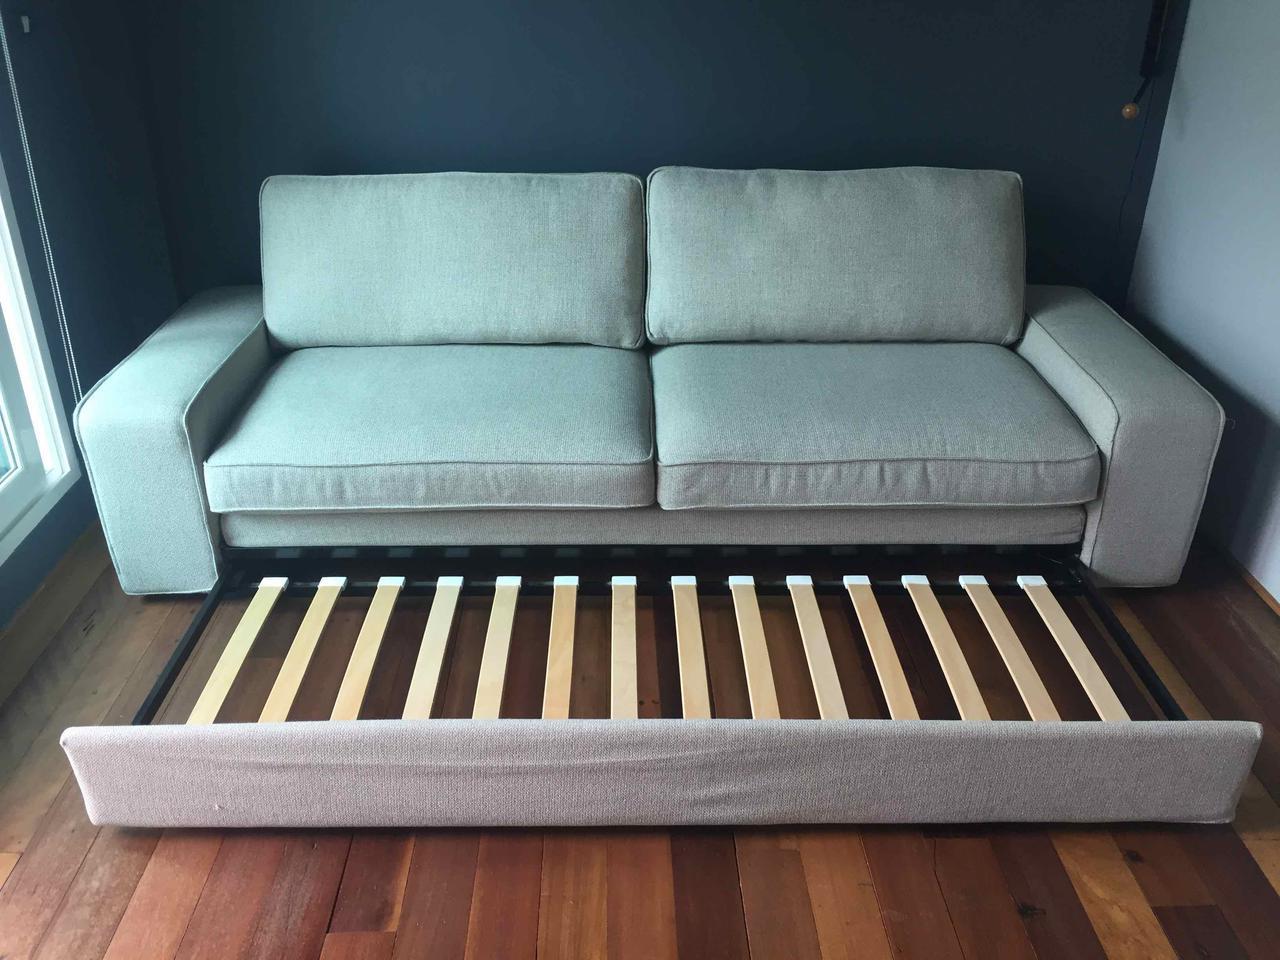 Sofa Bed Ikea 3 Seats รุ่น KIVIK รูปที่ 3